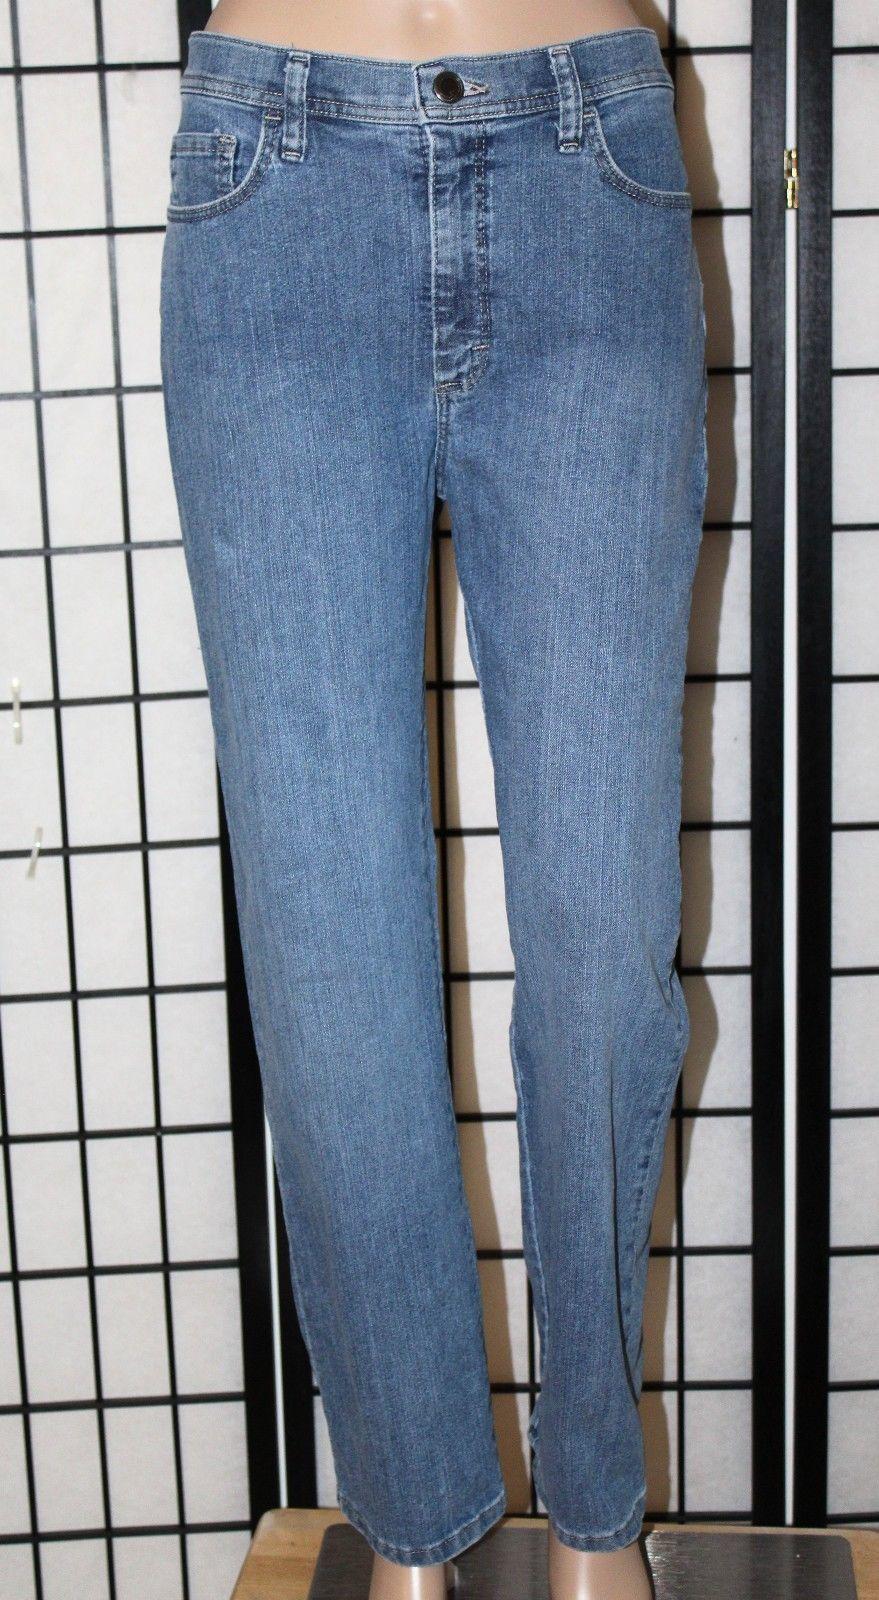 "LEE Classic Fit Women's Size 12 Short Straight Leg Stretch Jeans 29"" Inseam EUC"